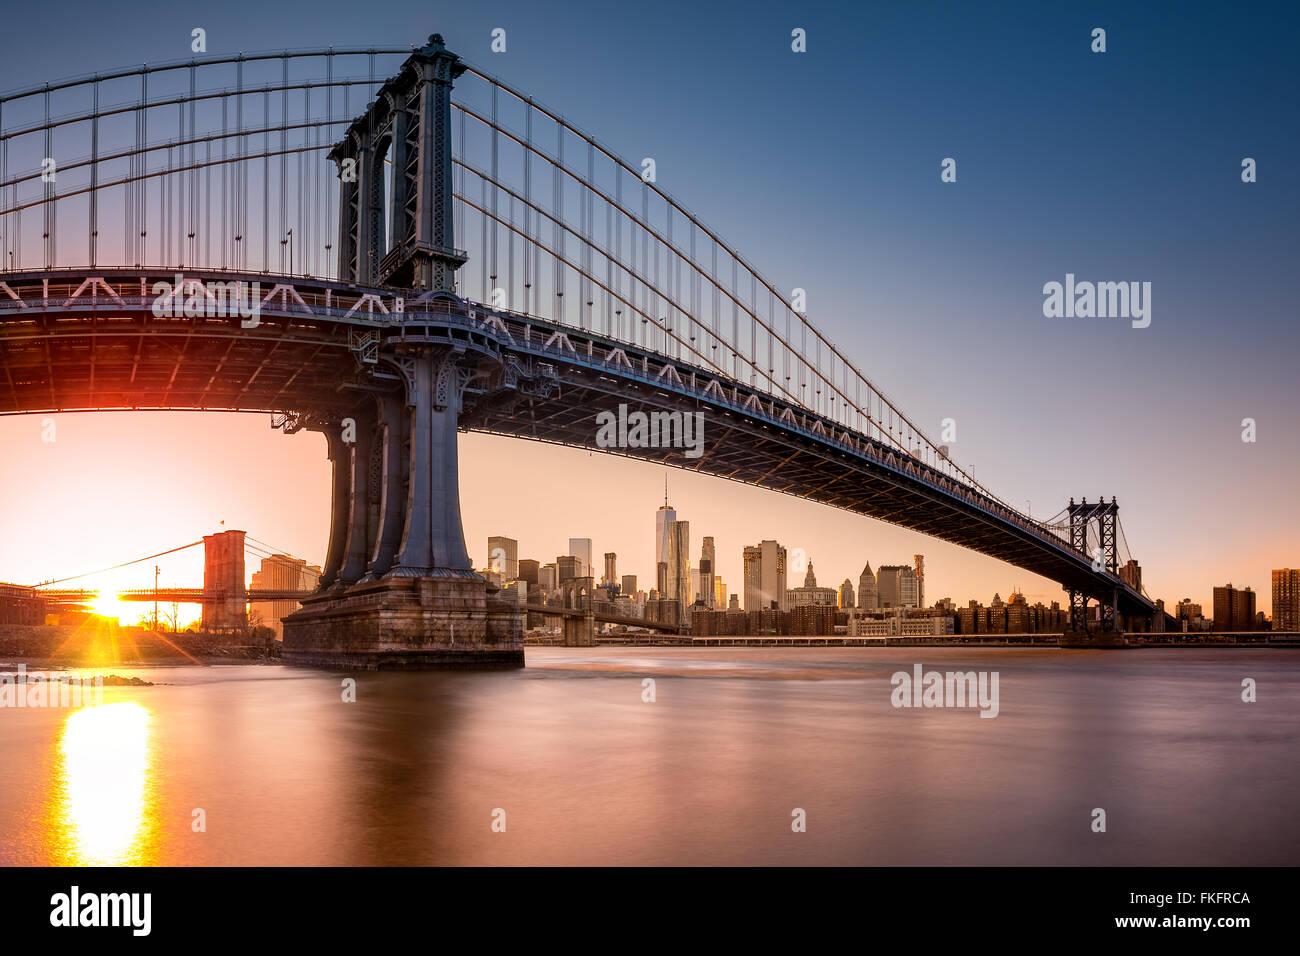 L'ossature du pont de Manhattan New York skyline at sunset. Photo Stock